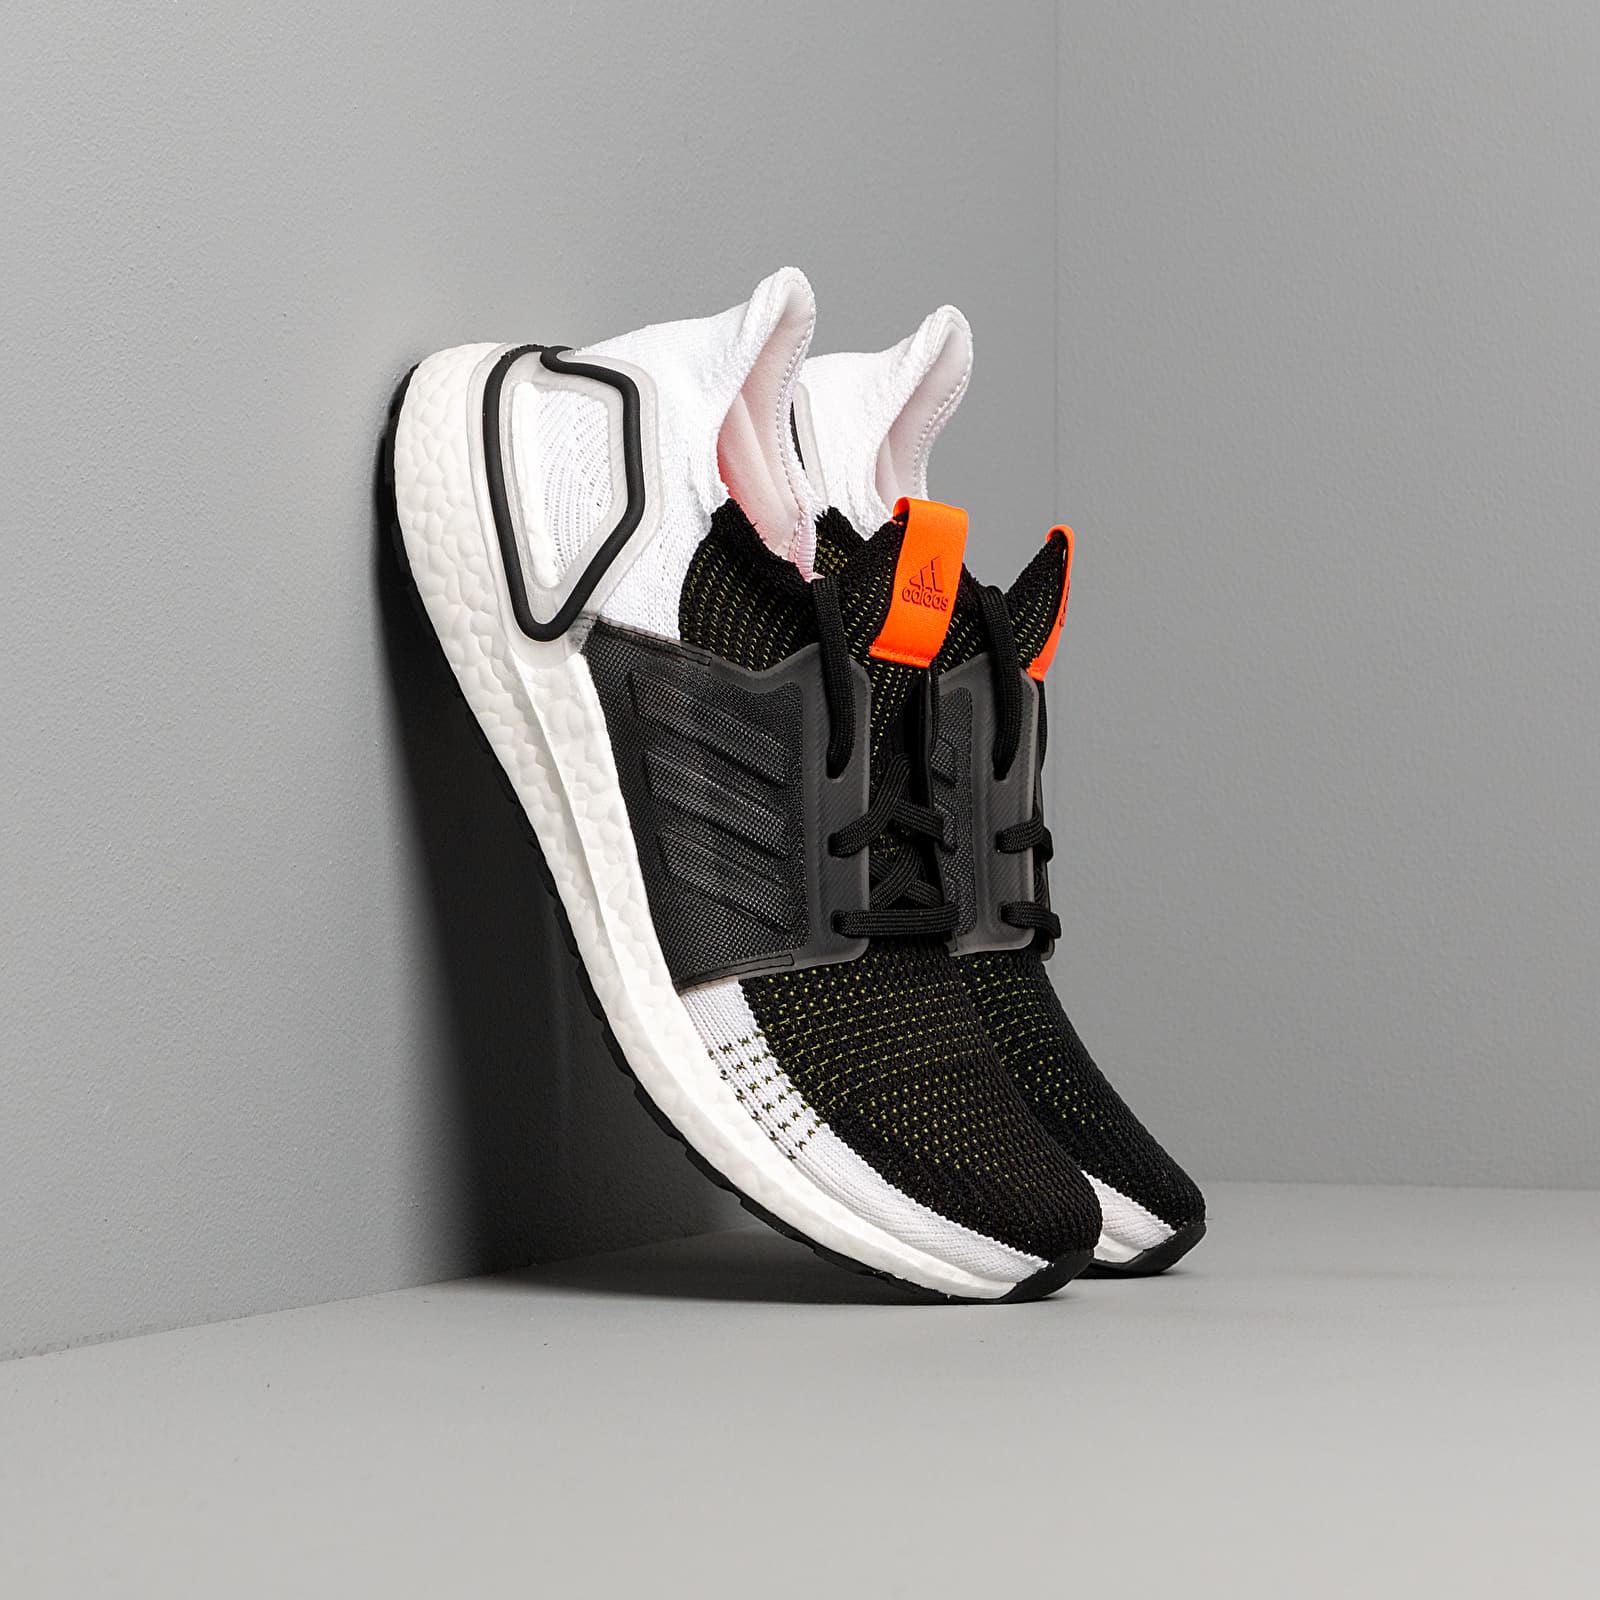 Men's shoes adidas UltraBOOST 19 M Tech Olive/ Core Black/ Solar Red